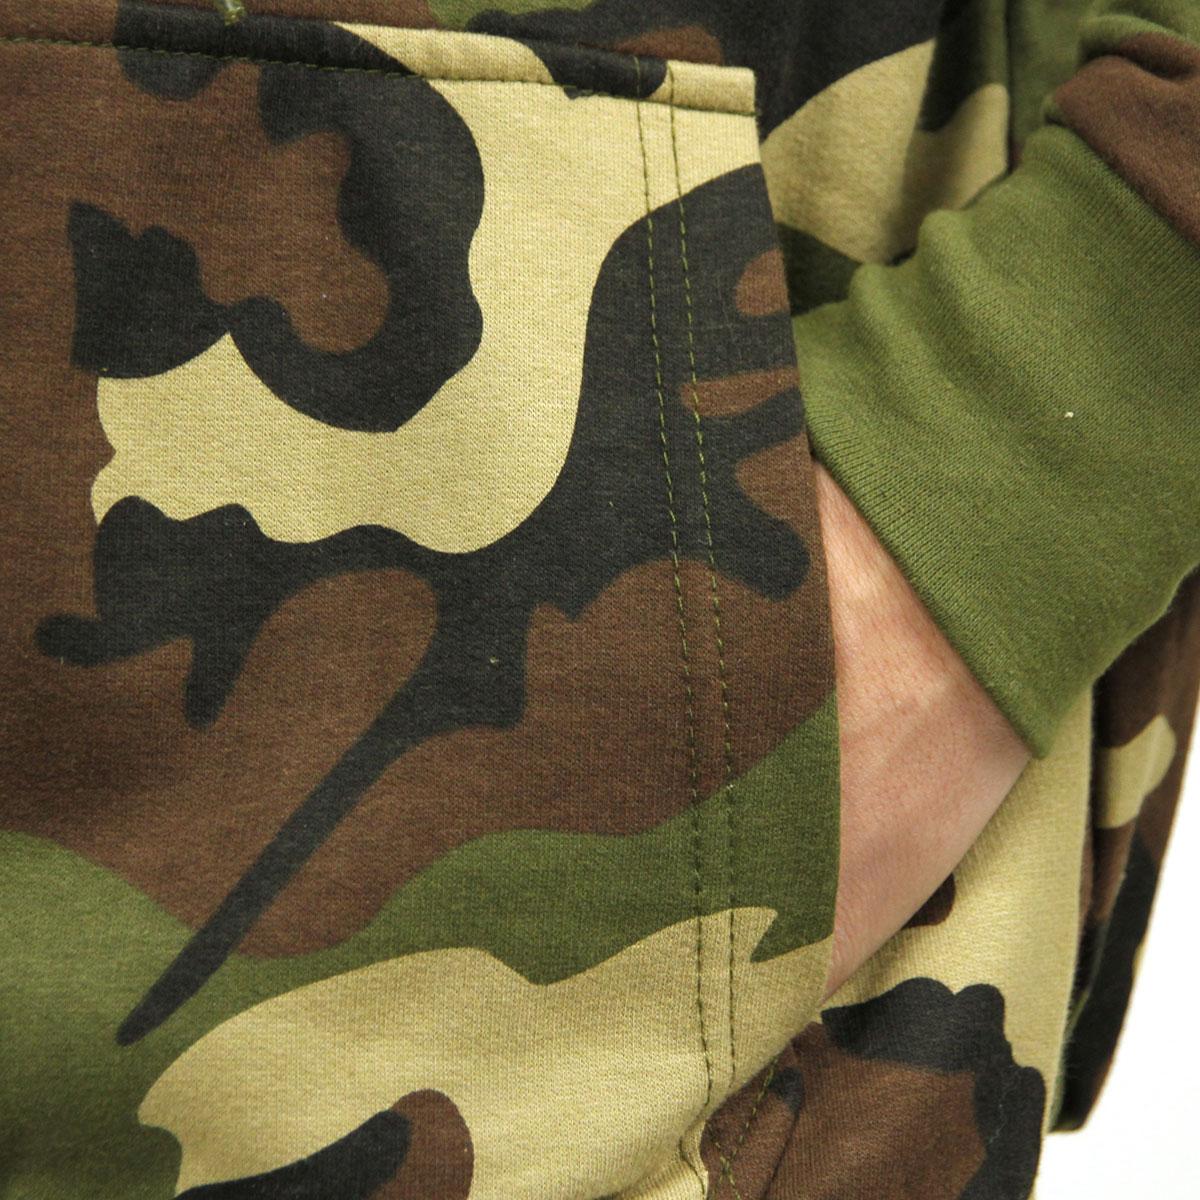 Rothco 6262 Thermal Lined Hooded Sweatshirt Woodland Camo